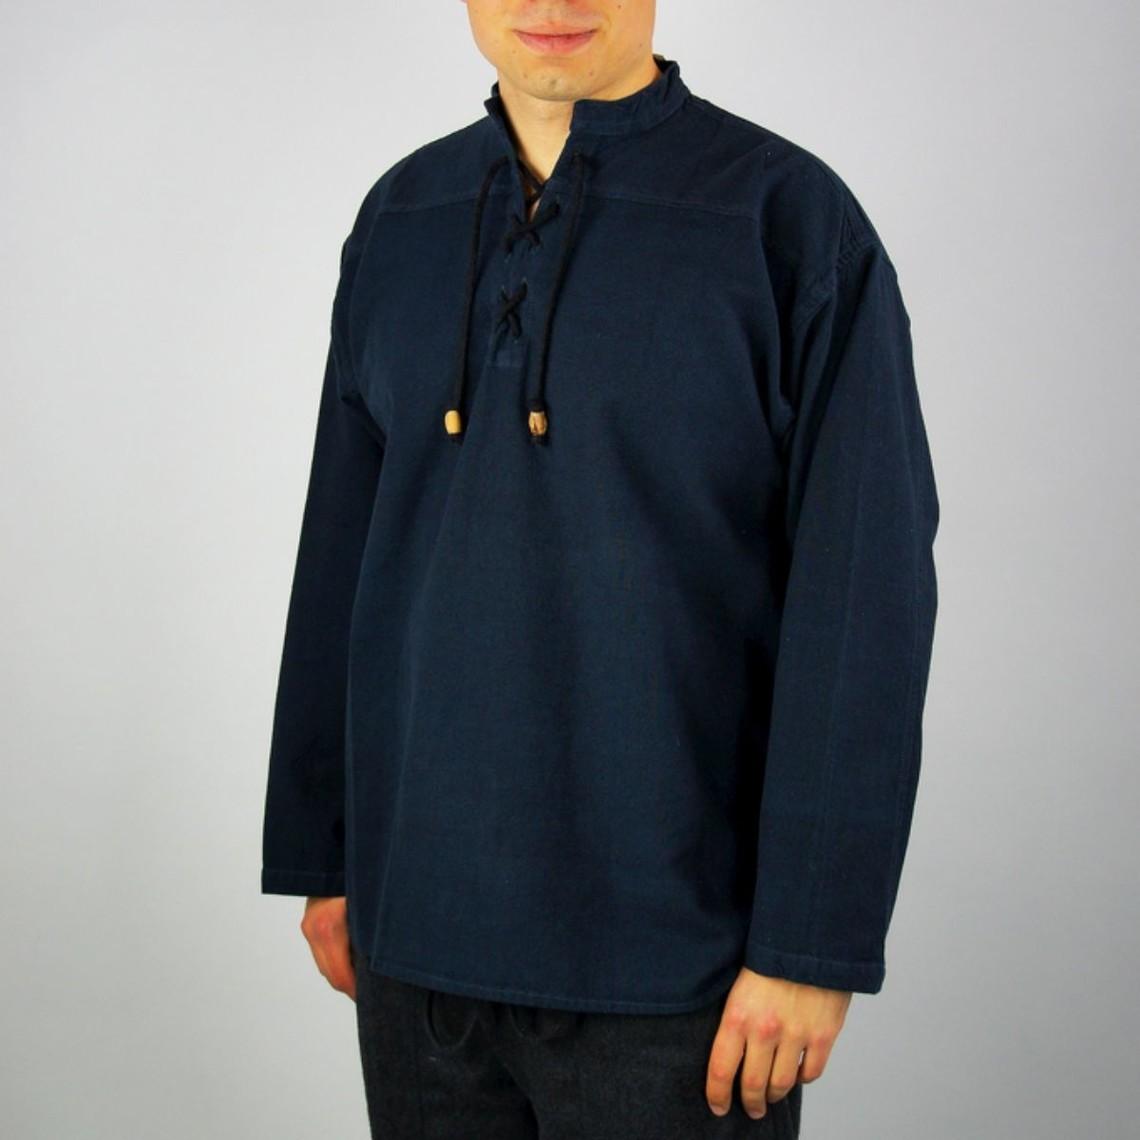 Leonardo Carbone Gewebtes Hemd, blau